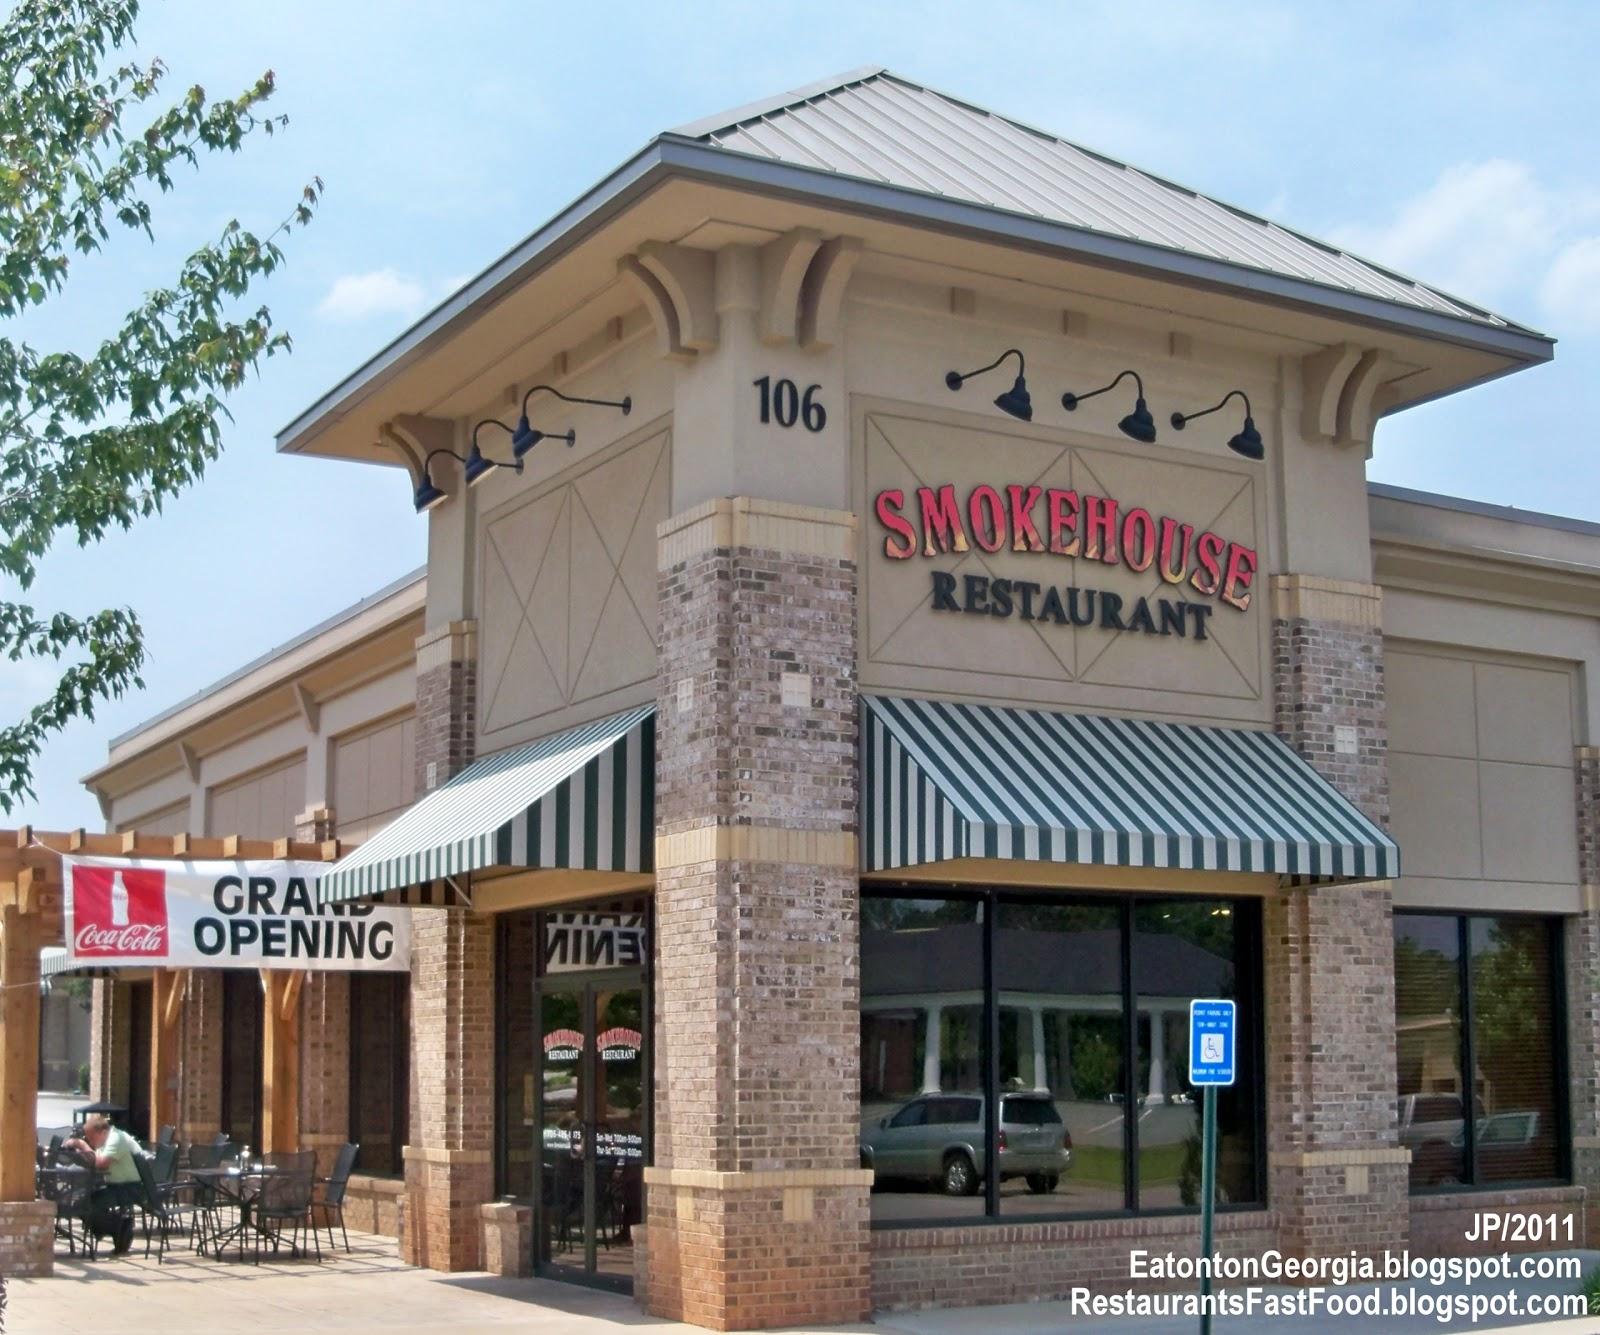 Smokehouse Restaurant Eatonton Georgia Lake Oconee Bbq Burgers Steak Casual Ga Putnam County